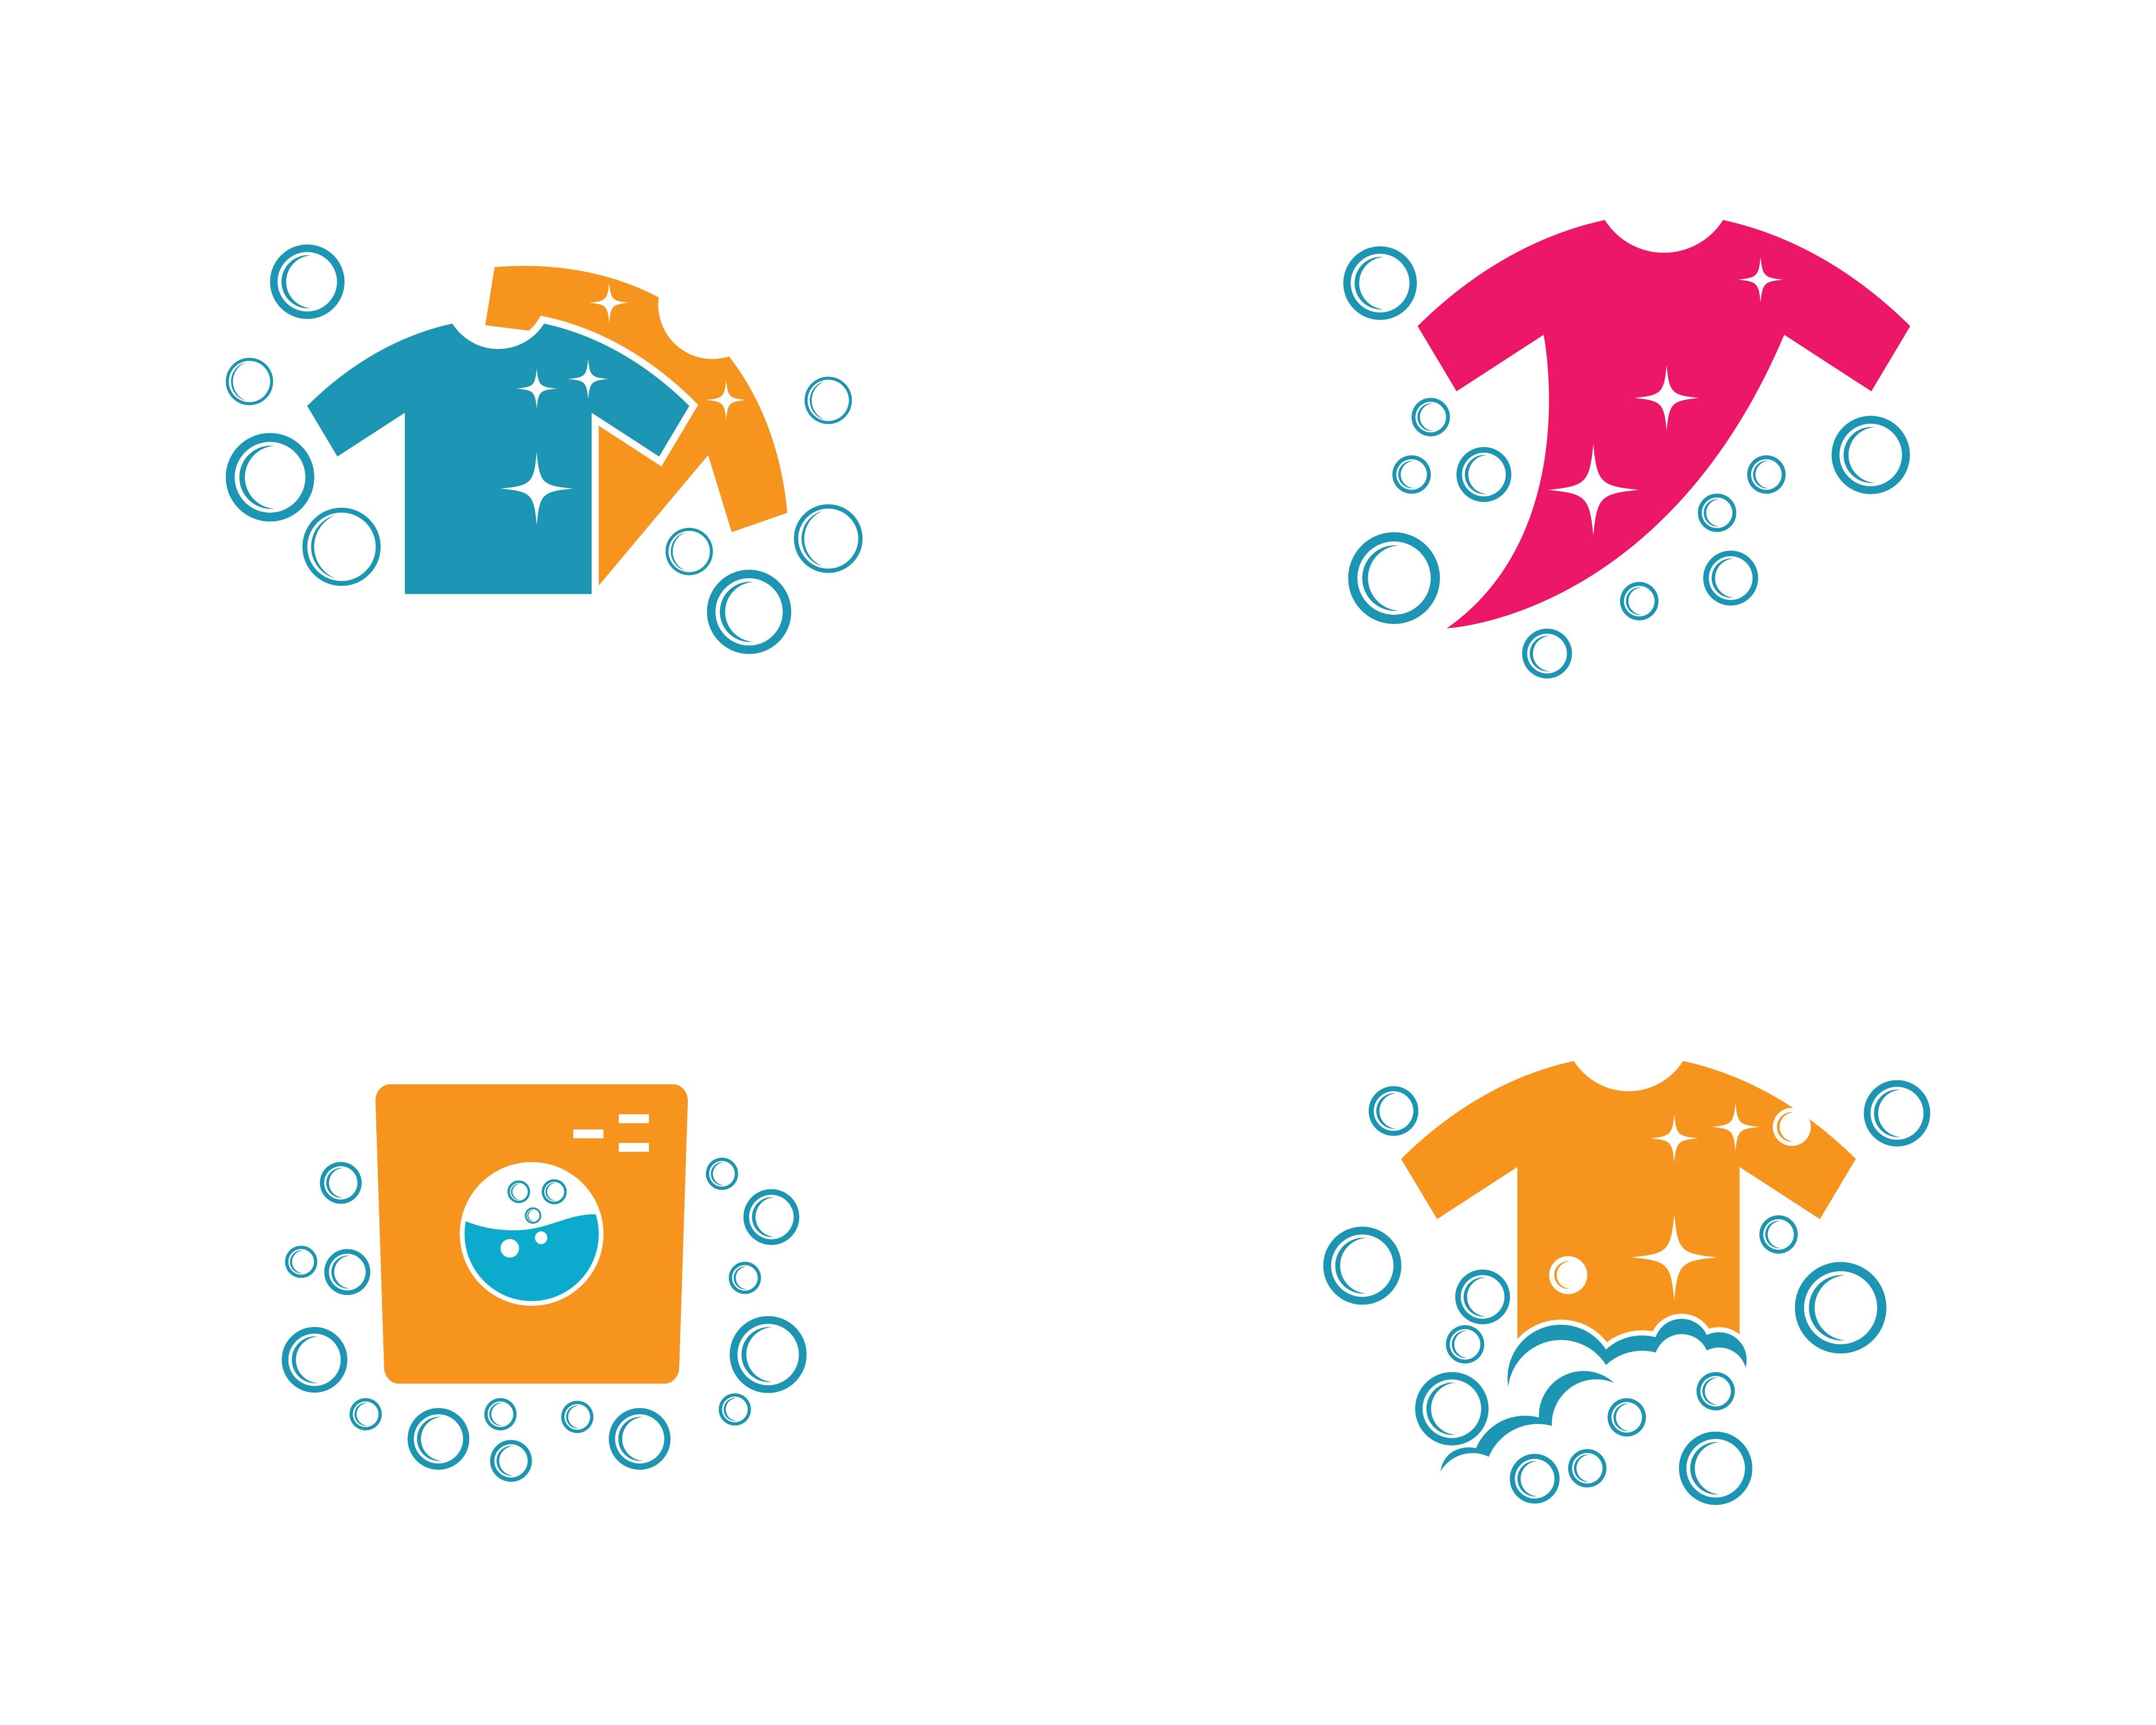 laundry logo free vector art 16 free downloads vecteezy